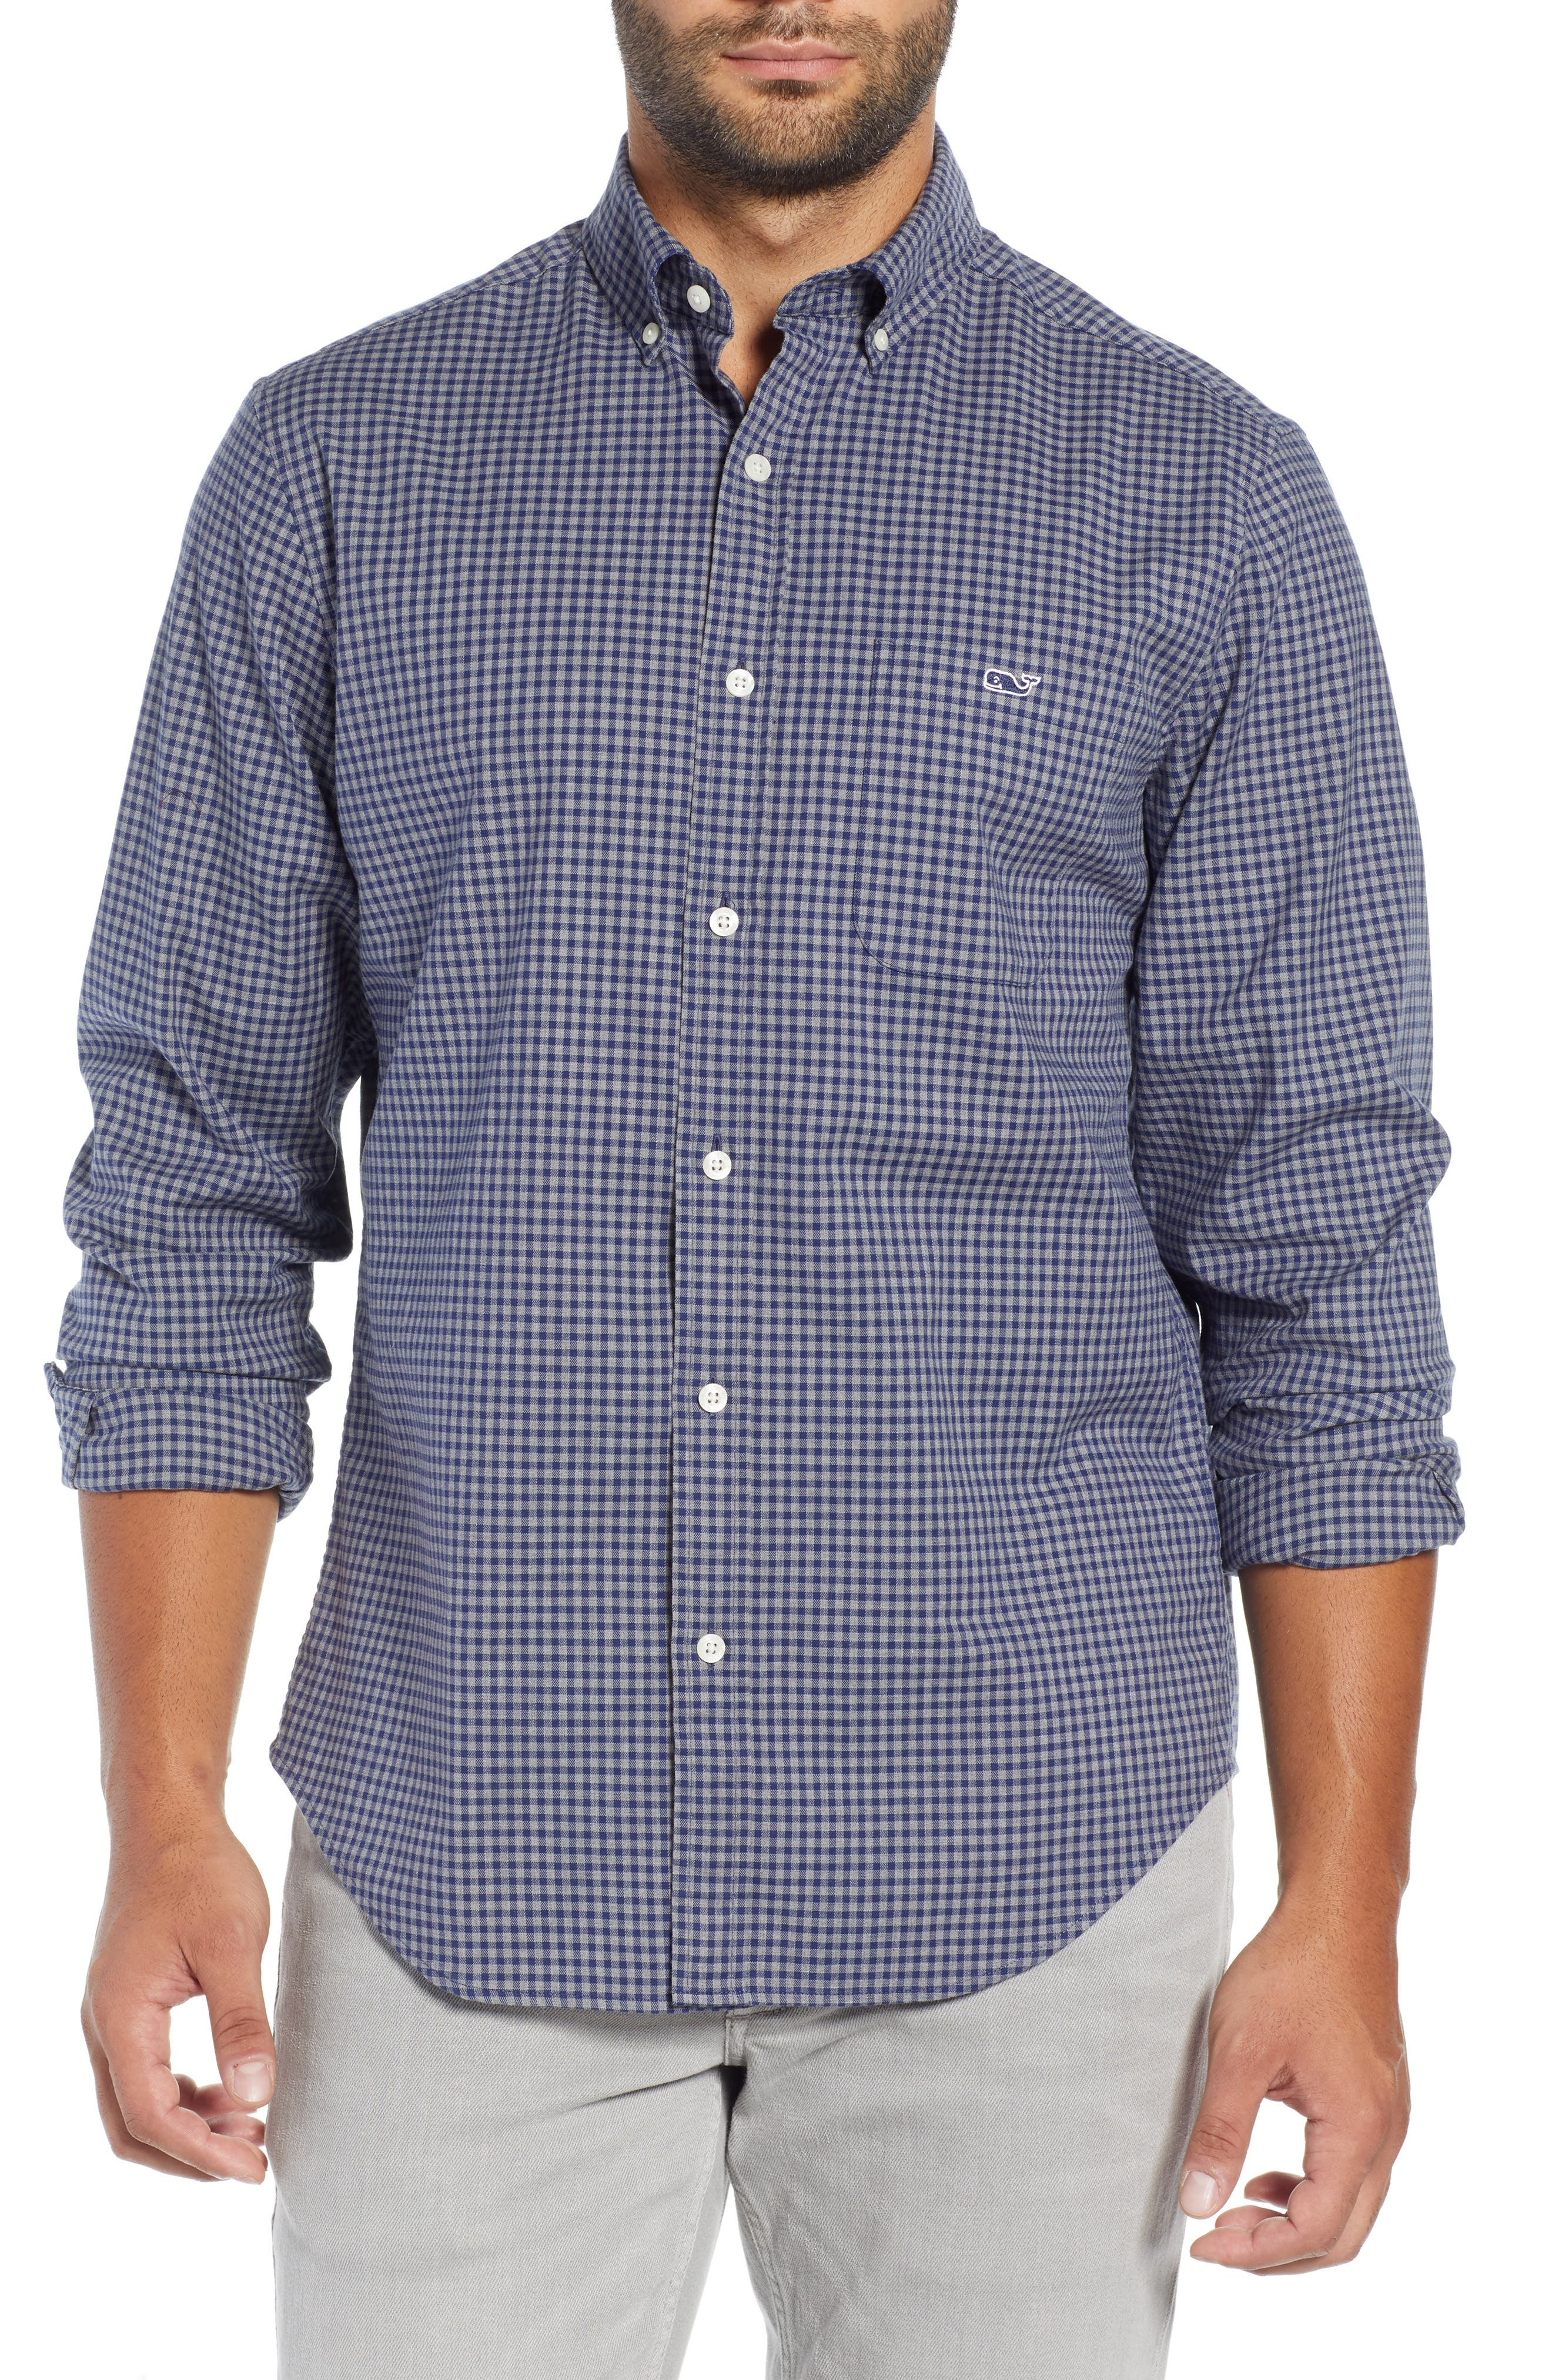 Pin Oak Tucker Gingham Classic Fit Button-Down Shirt in Evening Sky